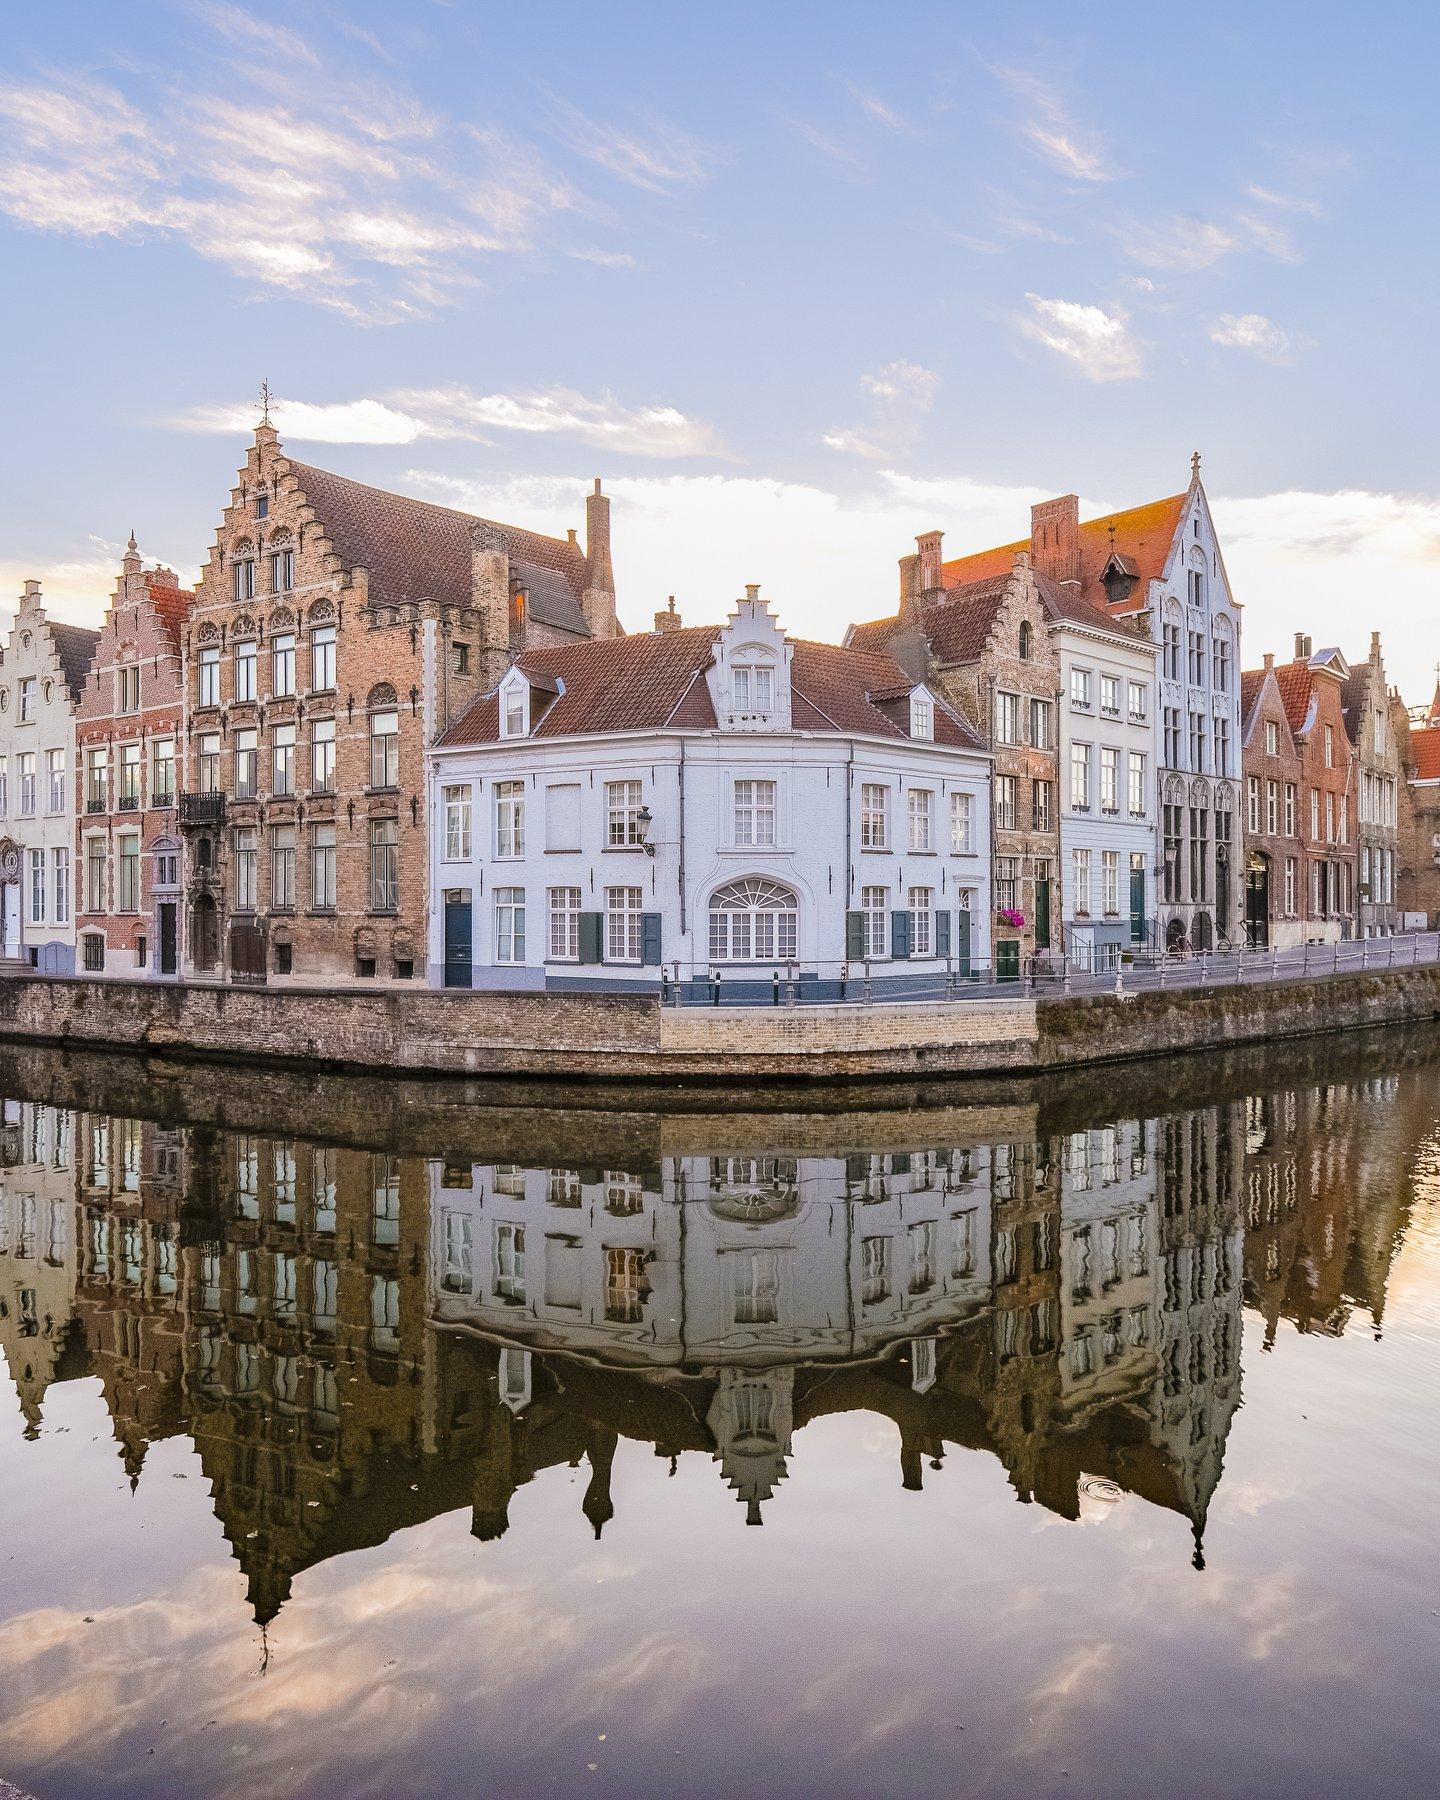 Brugge - Winter Travel Europe 2020